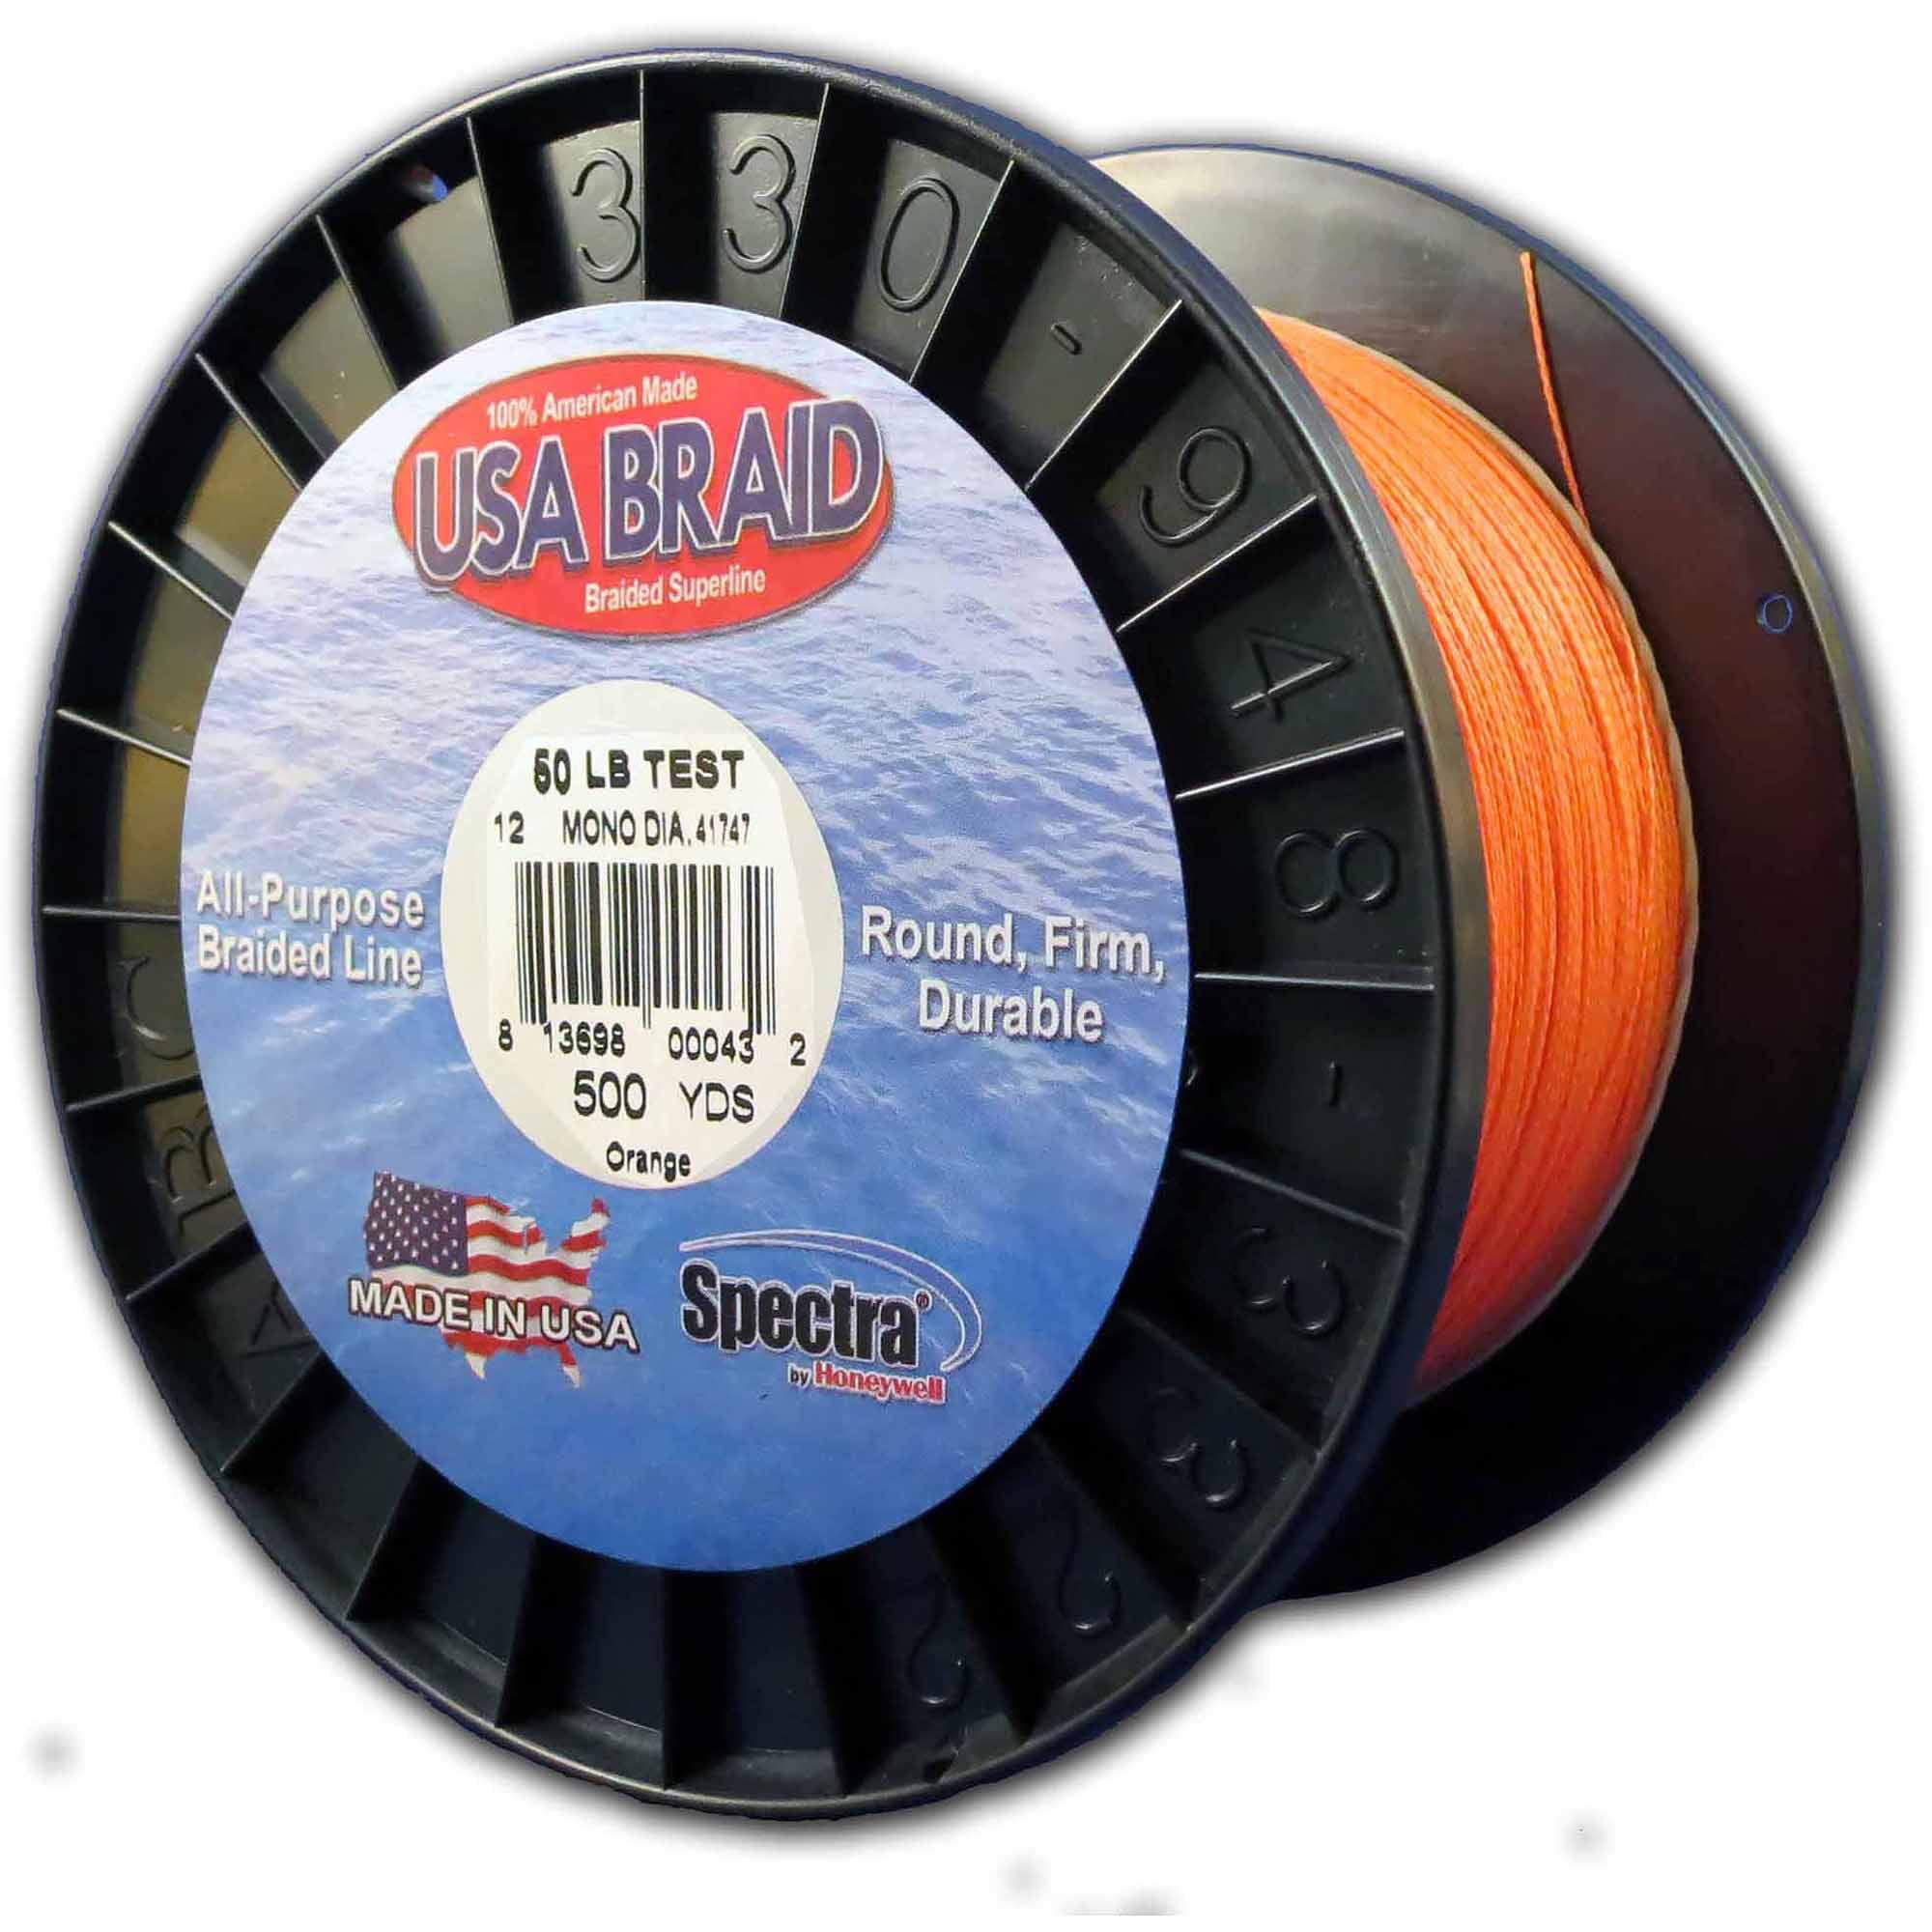 Spectra Orange All-Purpose Braided Superline by